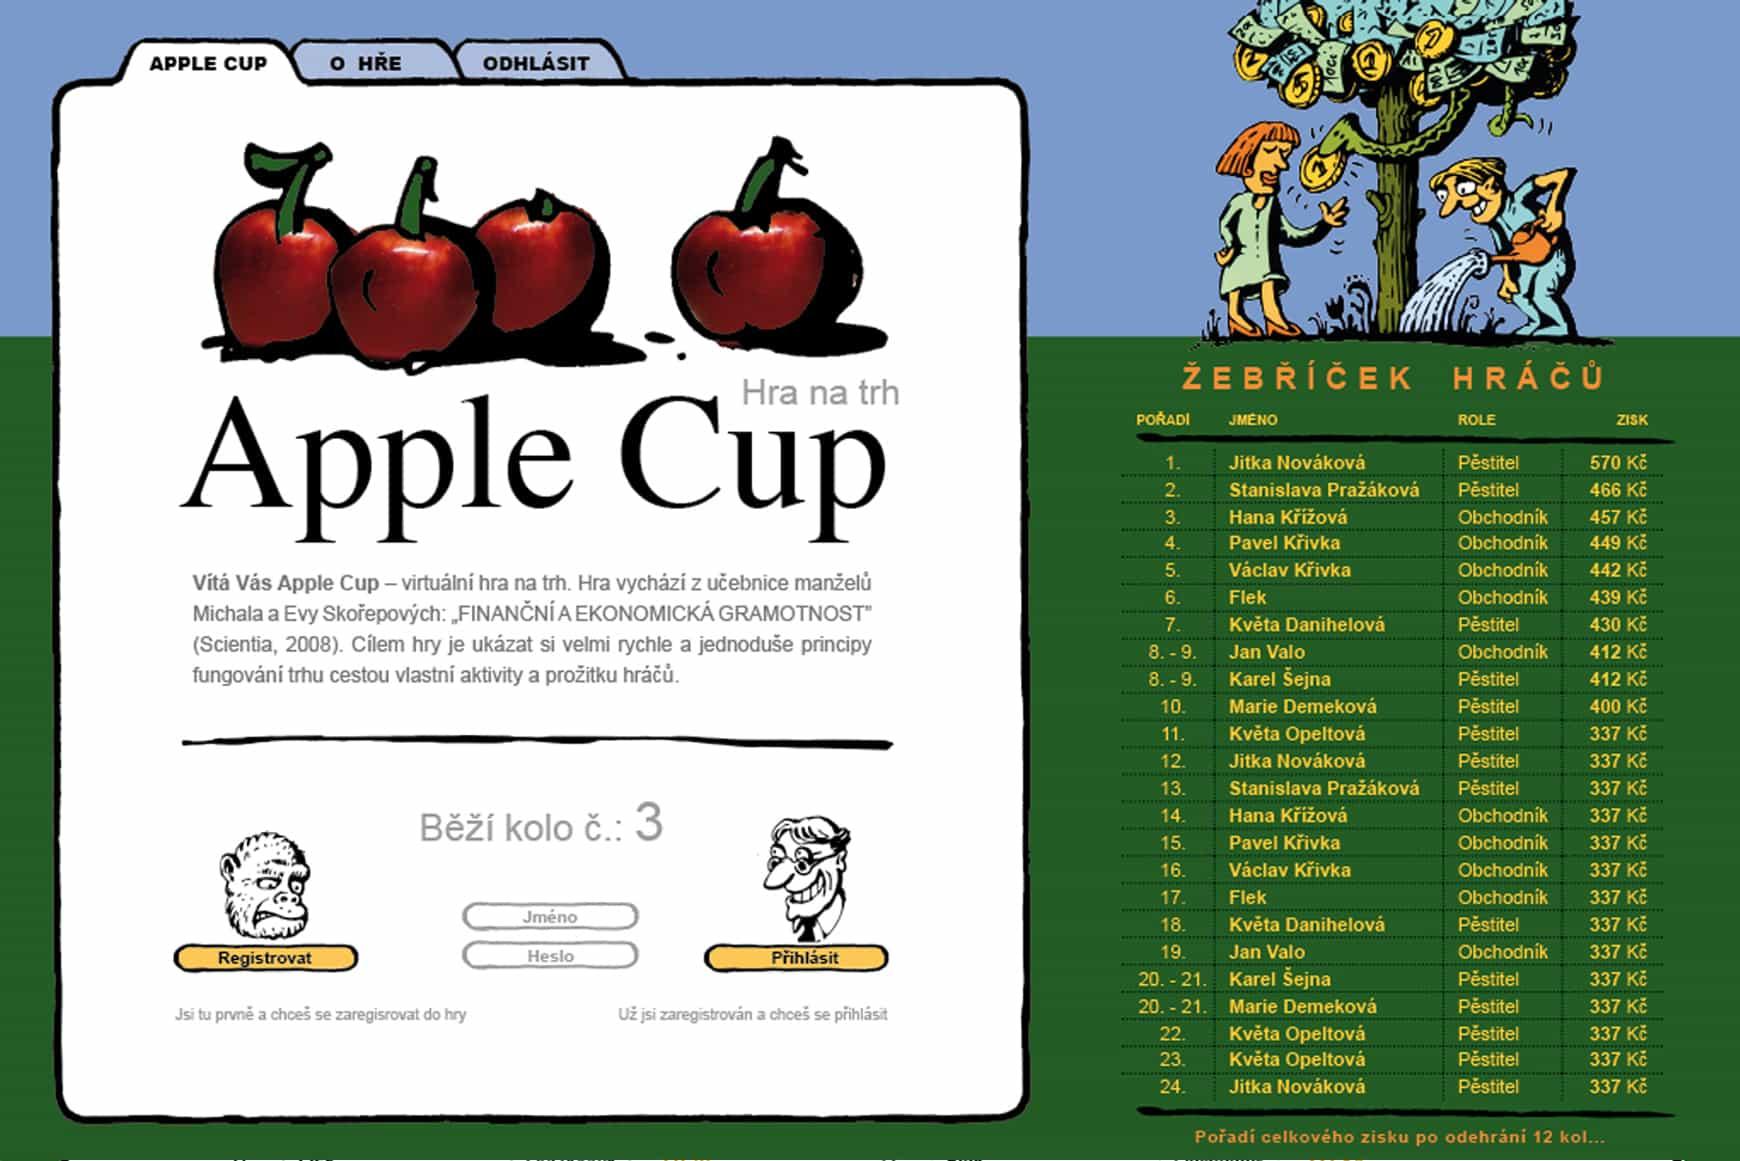 AppleCup